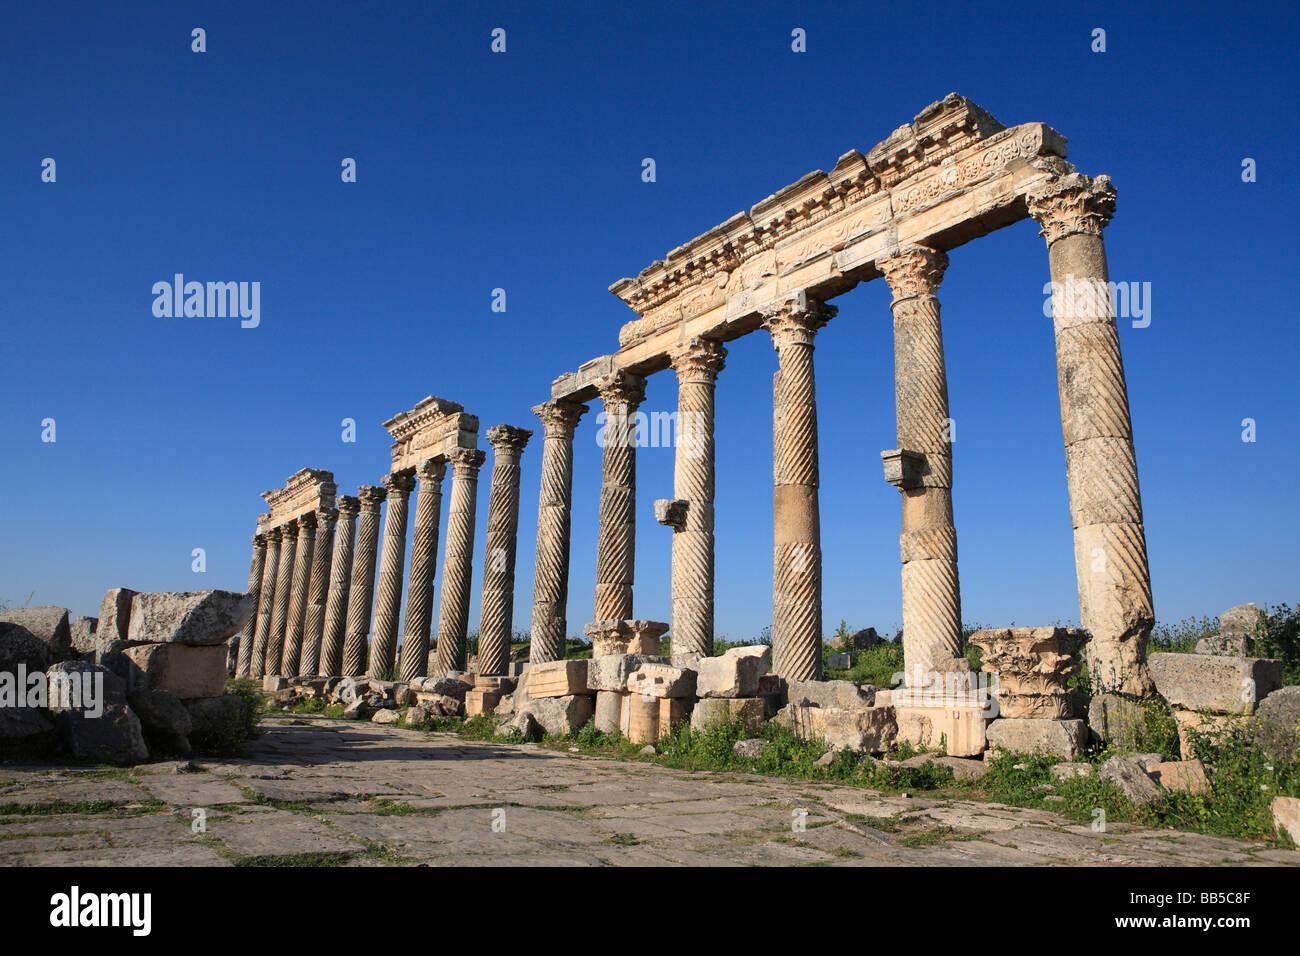 The Ruins of Apamea, Syria - Stock Image